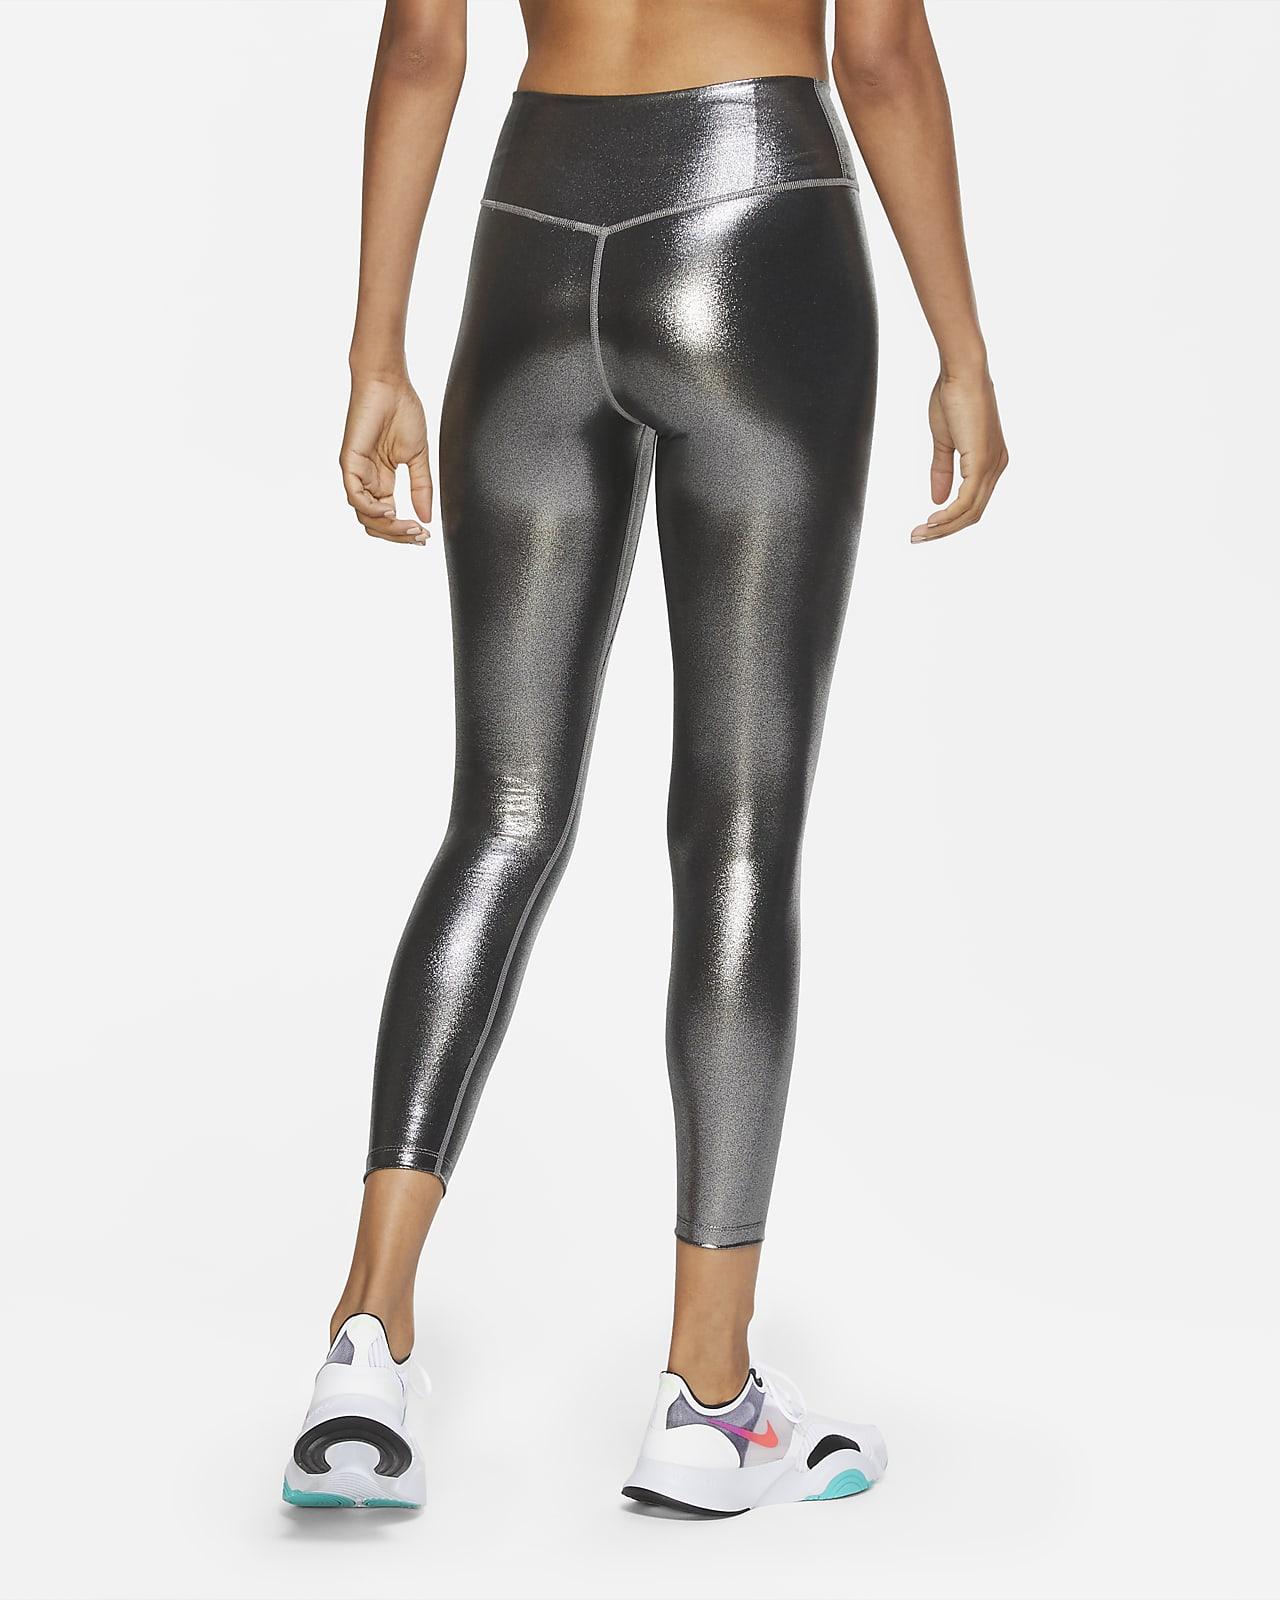 Womens Yoga Workout Leggings Shimmer Black One Size